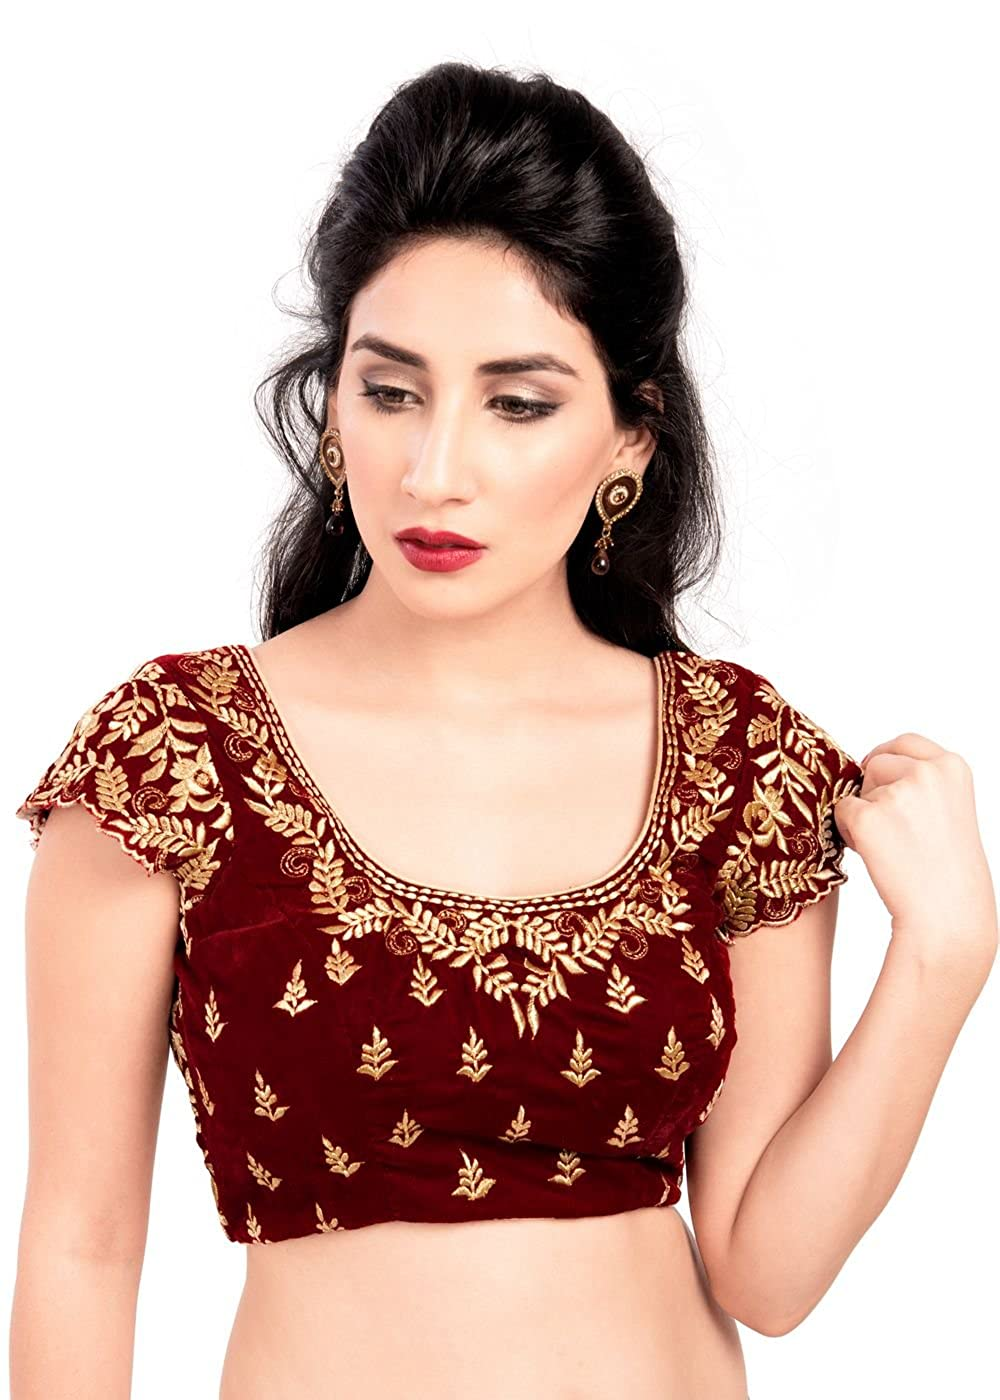 91e264b1286 Amazon.com: Elegant Maroon Velvet Ready-made Indian Saree Blouse - KP-46:  Clothing